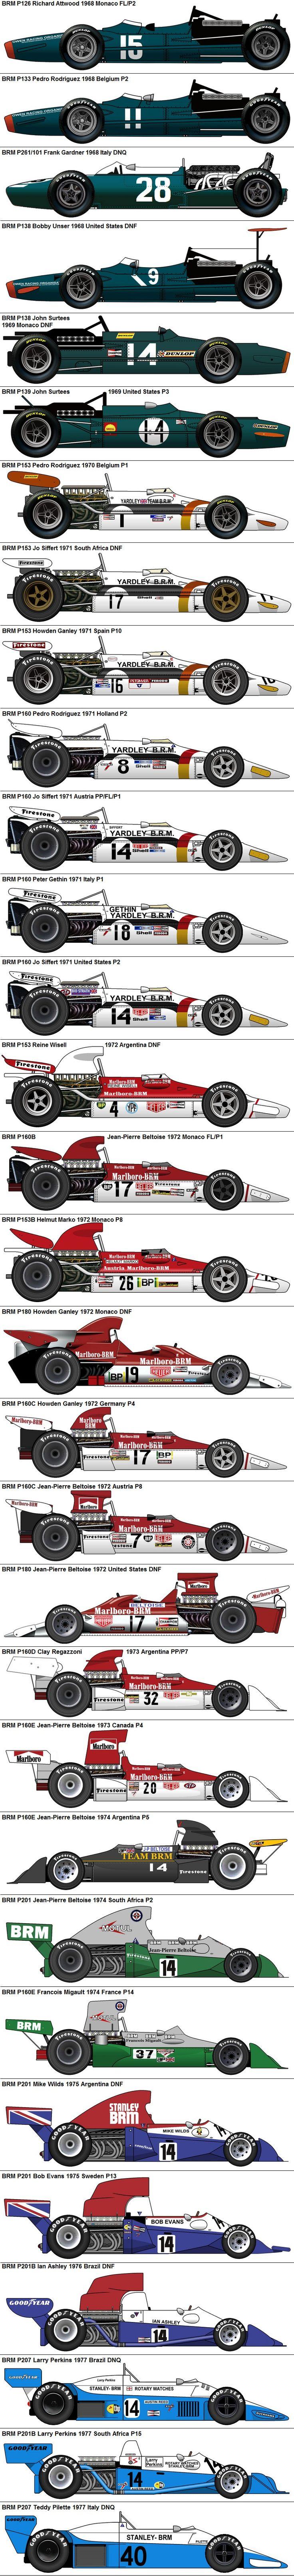 Formel 1 BRM – 1968 – 1977 – Richard Black